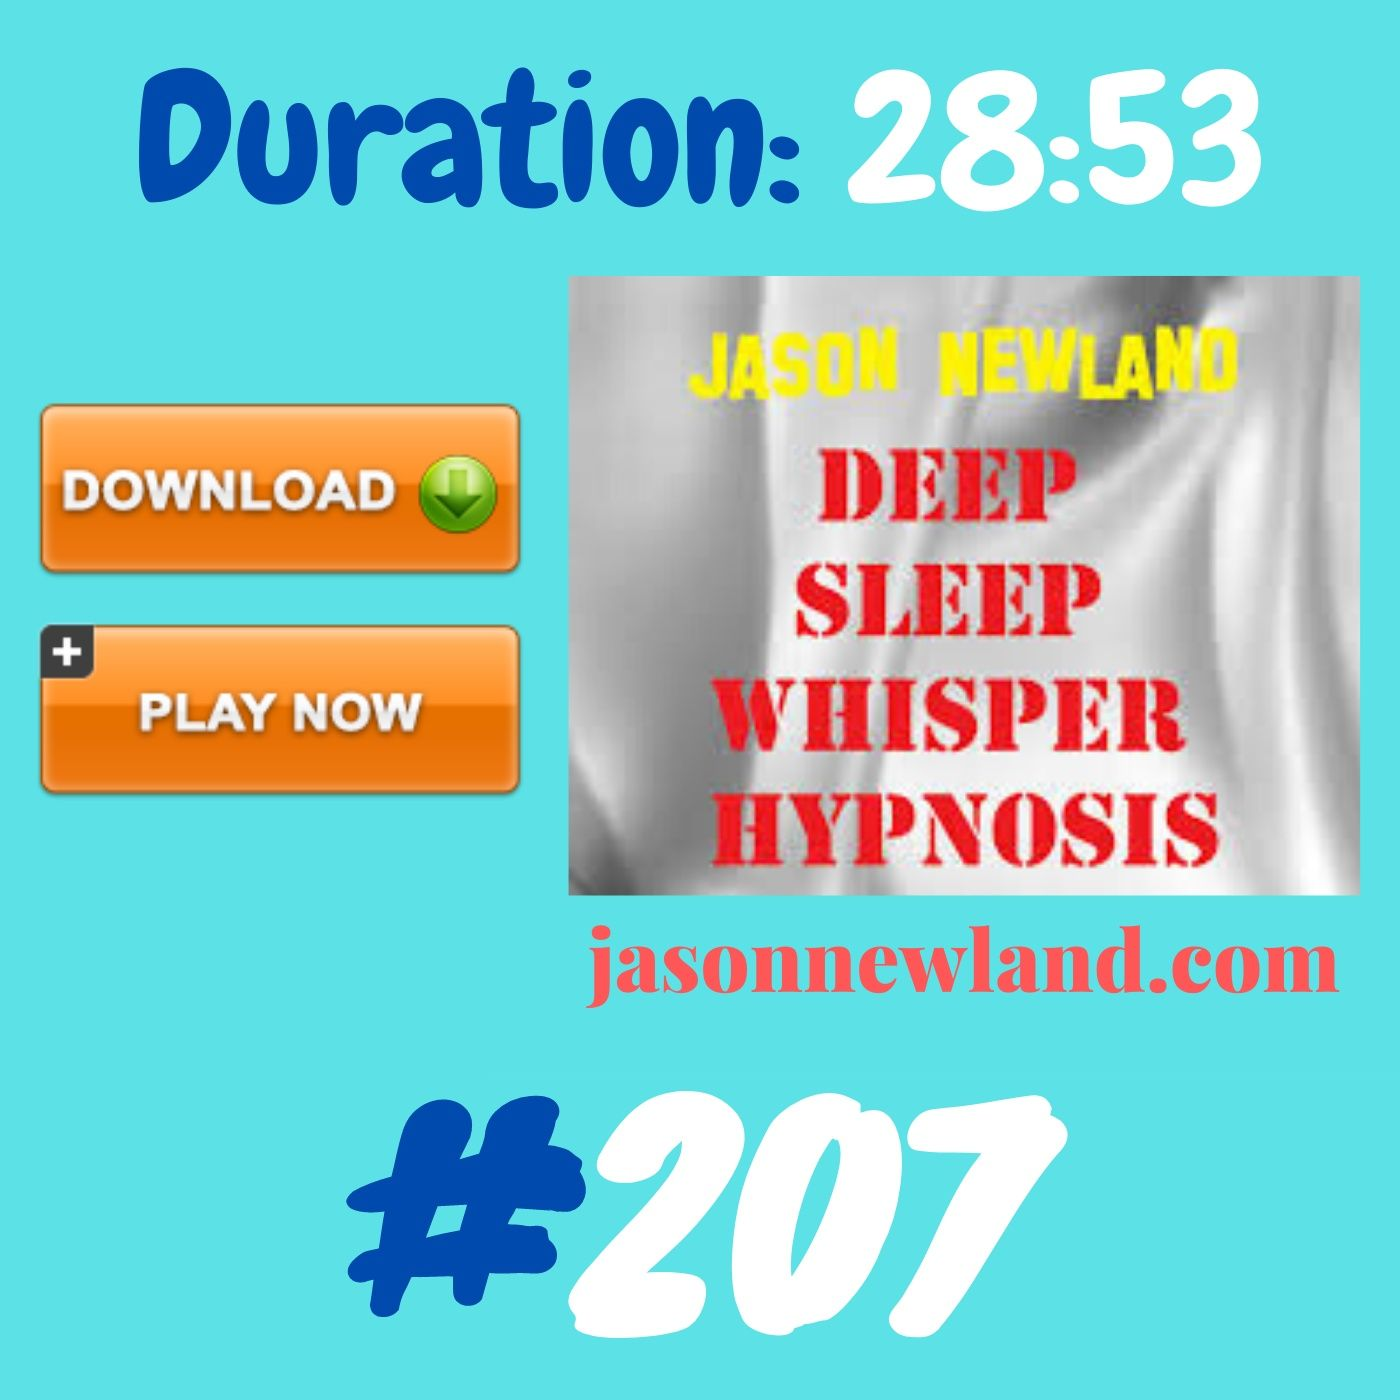 #361 Deep Sleep Whisper Hypnosis (Jason Newland) with MUSIC